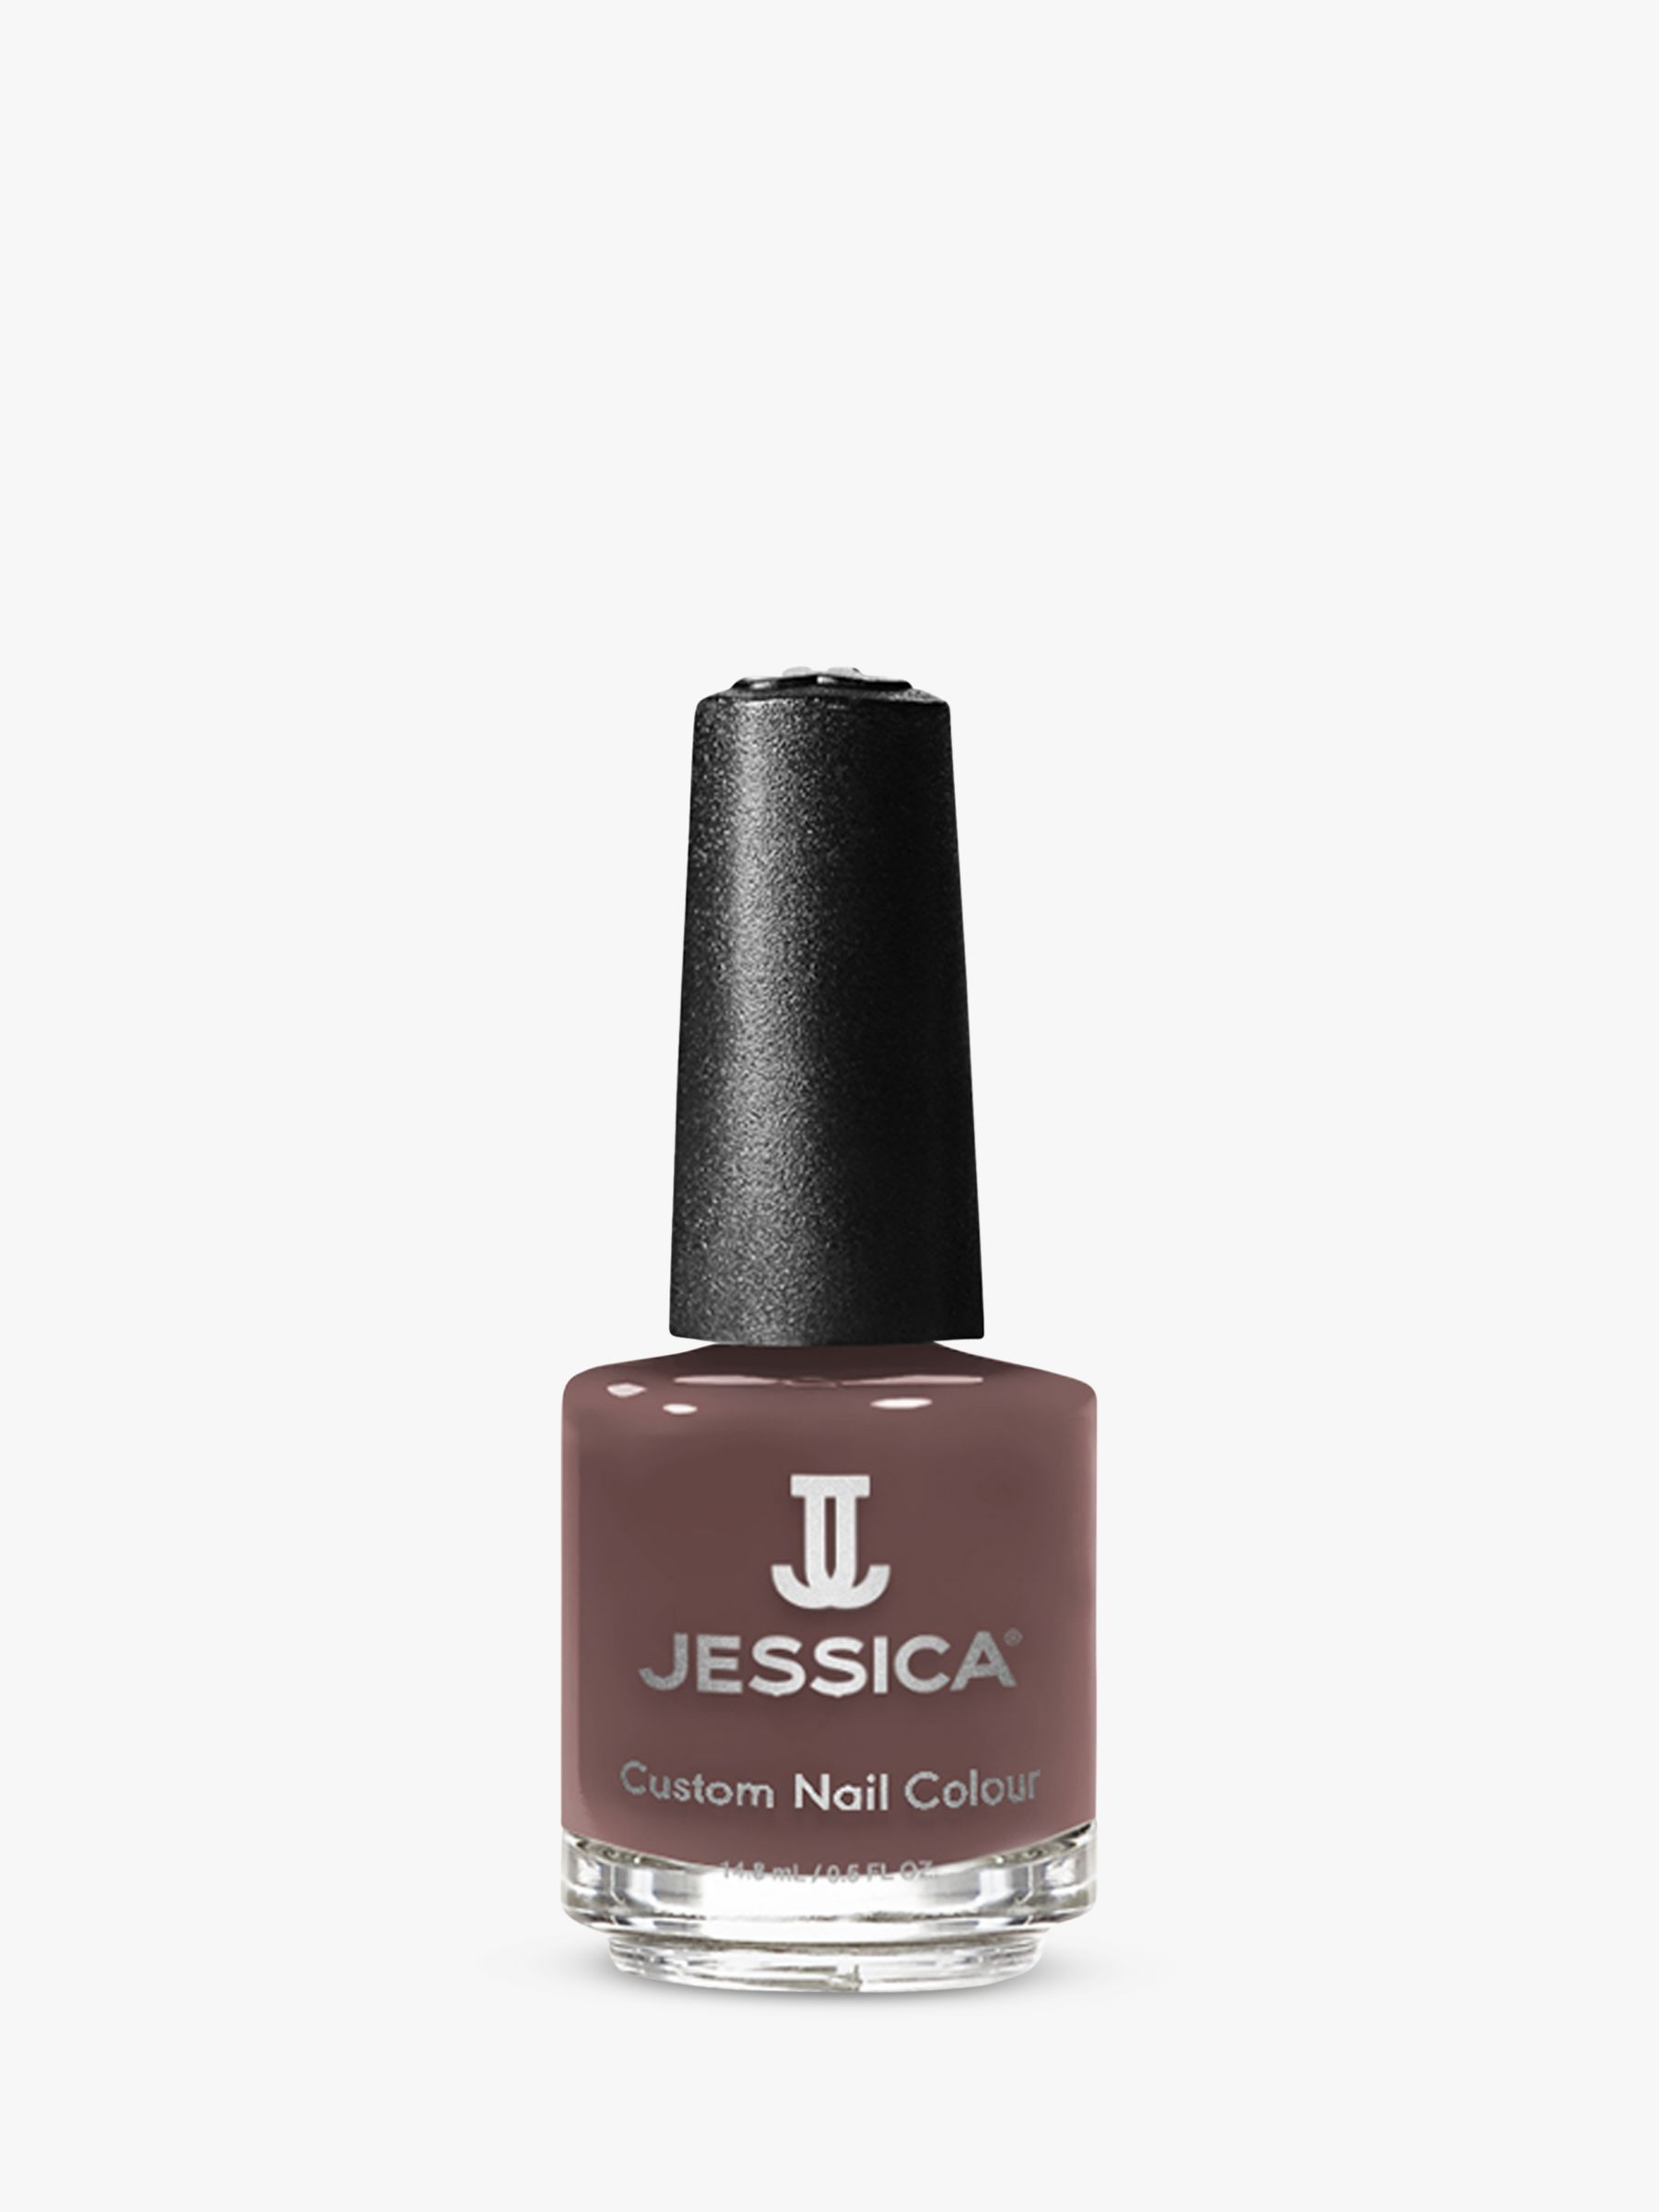 Jessica Jessica Custom Nail Colour - Darks and Greys